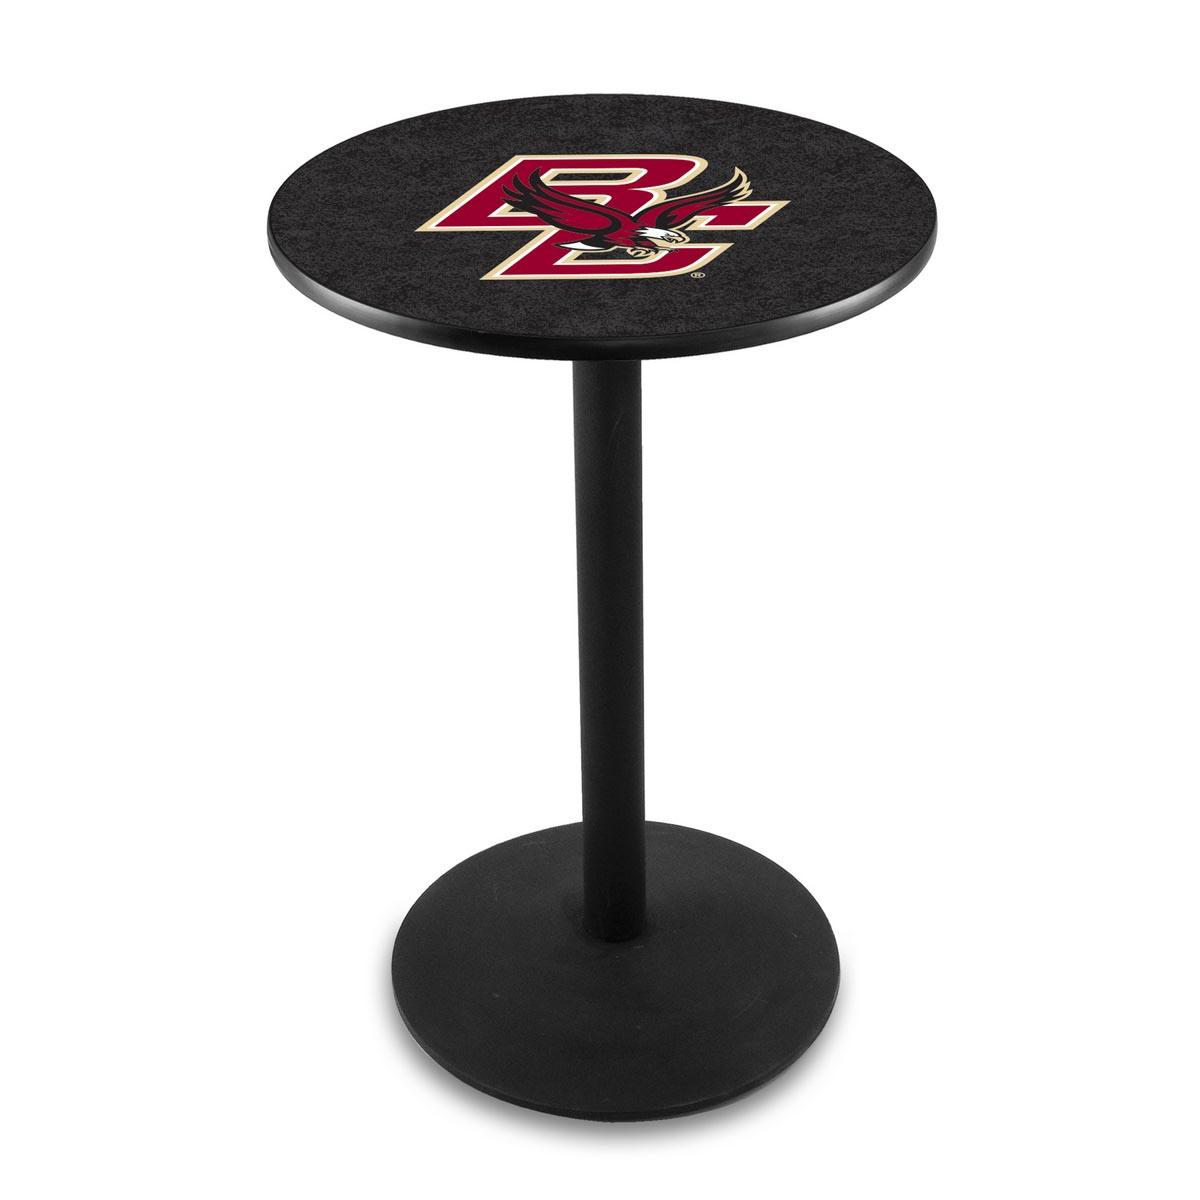 Amazing Boston College Logo Pub Bar Table Round Stand Product Photo